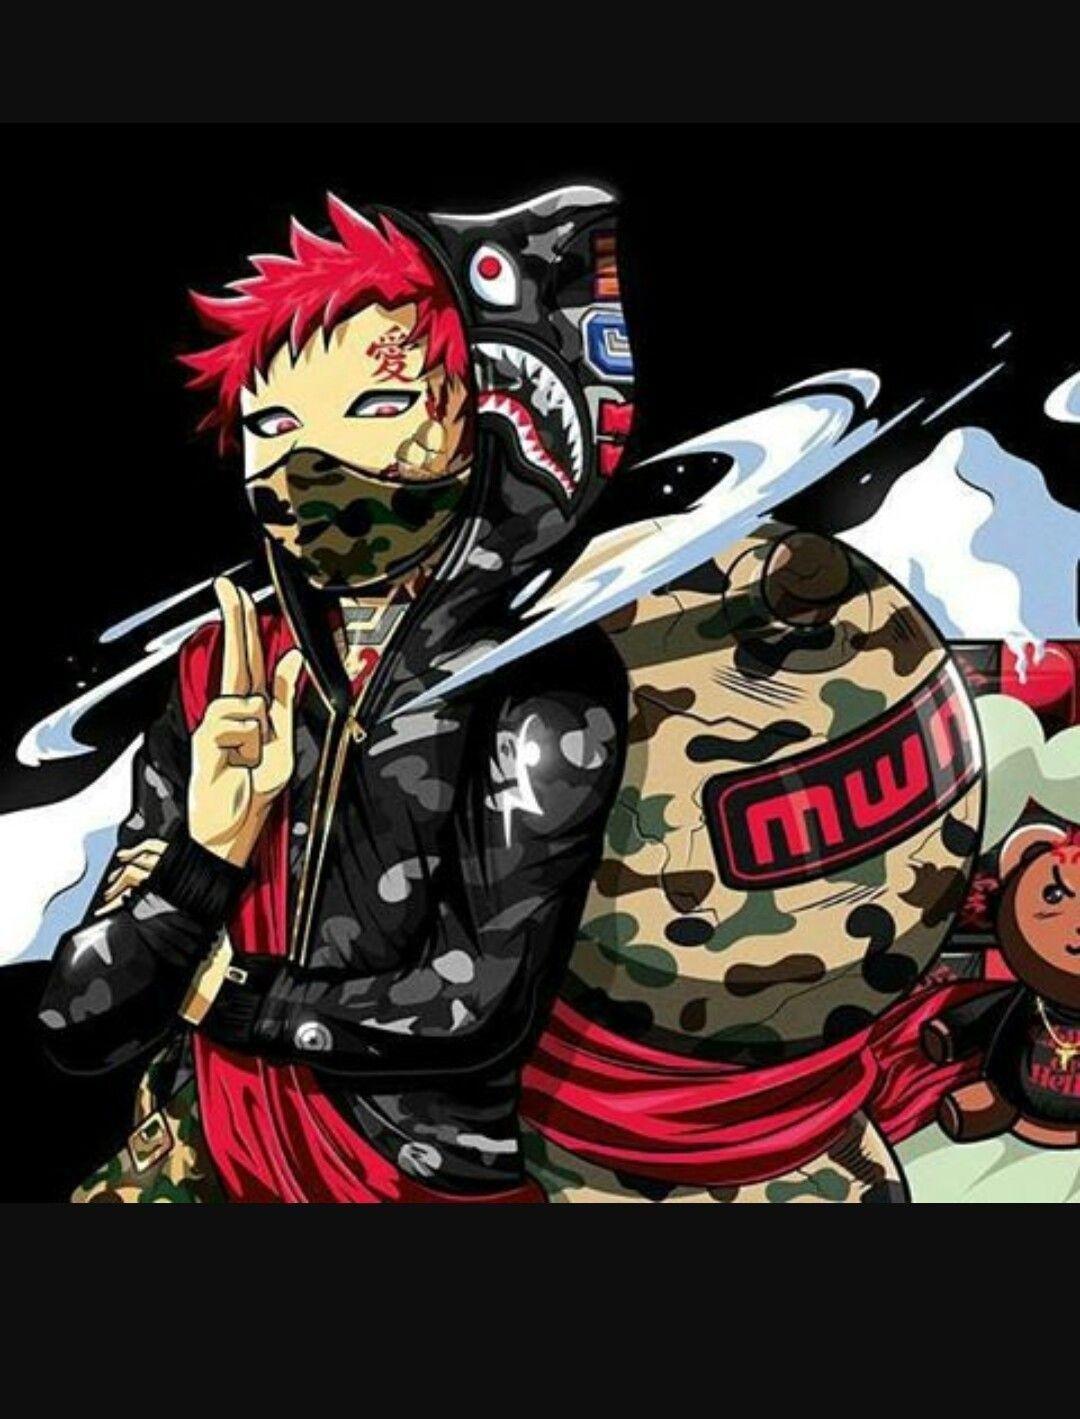 Naruto Supreme Wallpapers Top Free Naruto Supreme Backgrounds Wallpaperaccess